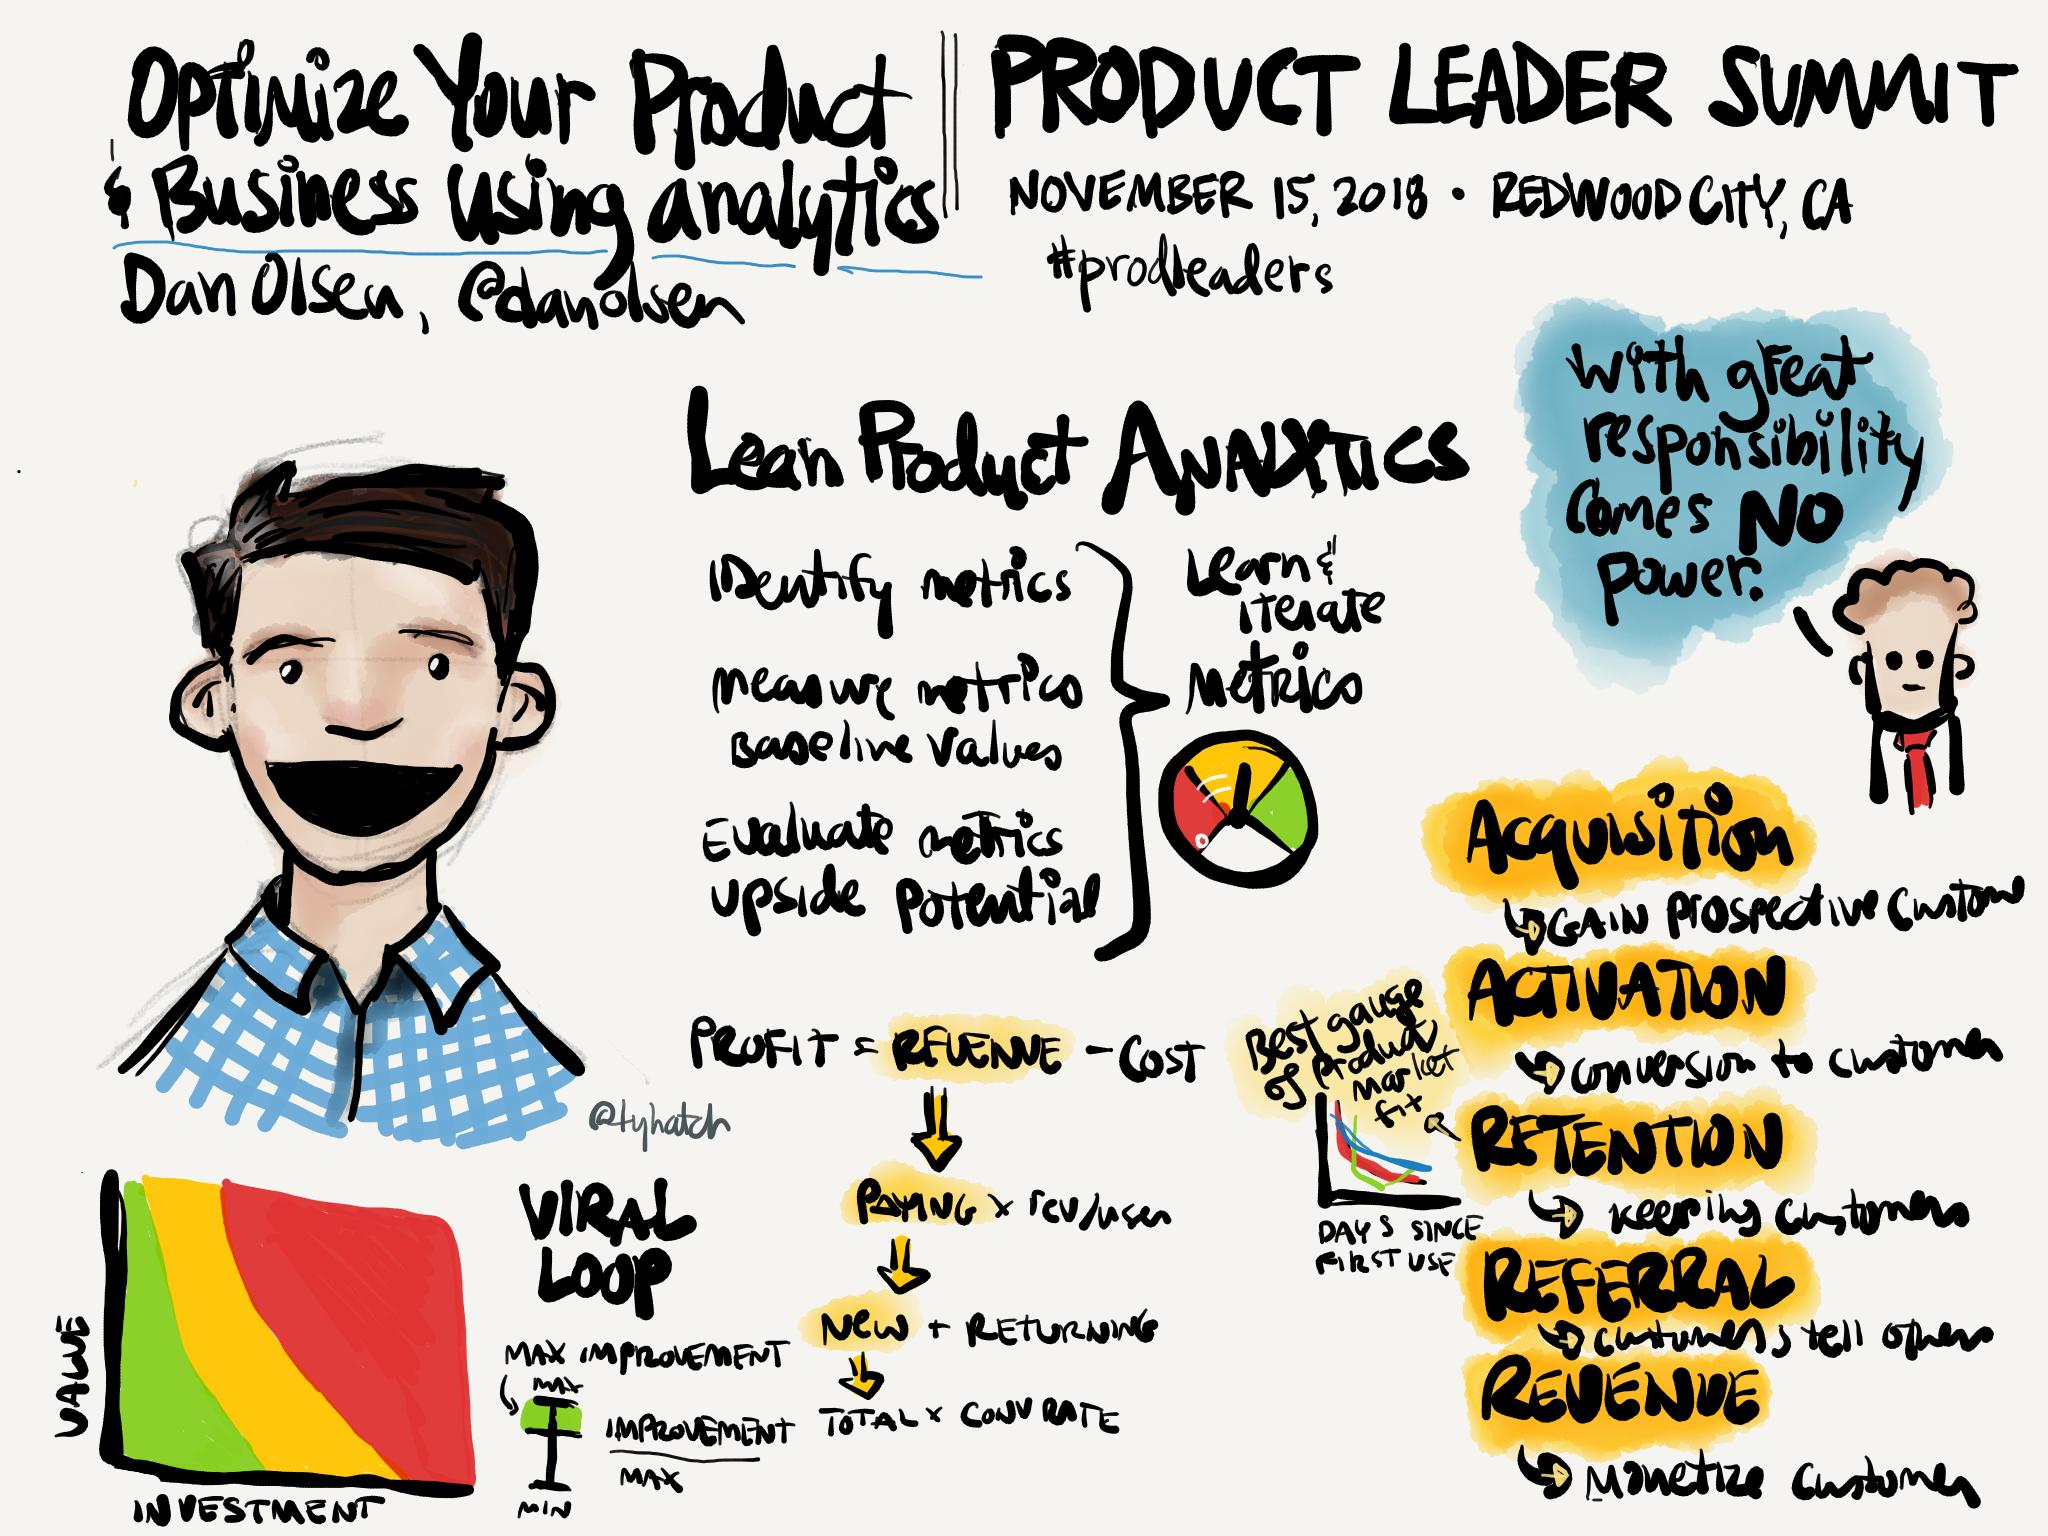 Dan Olsen talk: Optimize Your Product & Business using Analytics